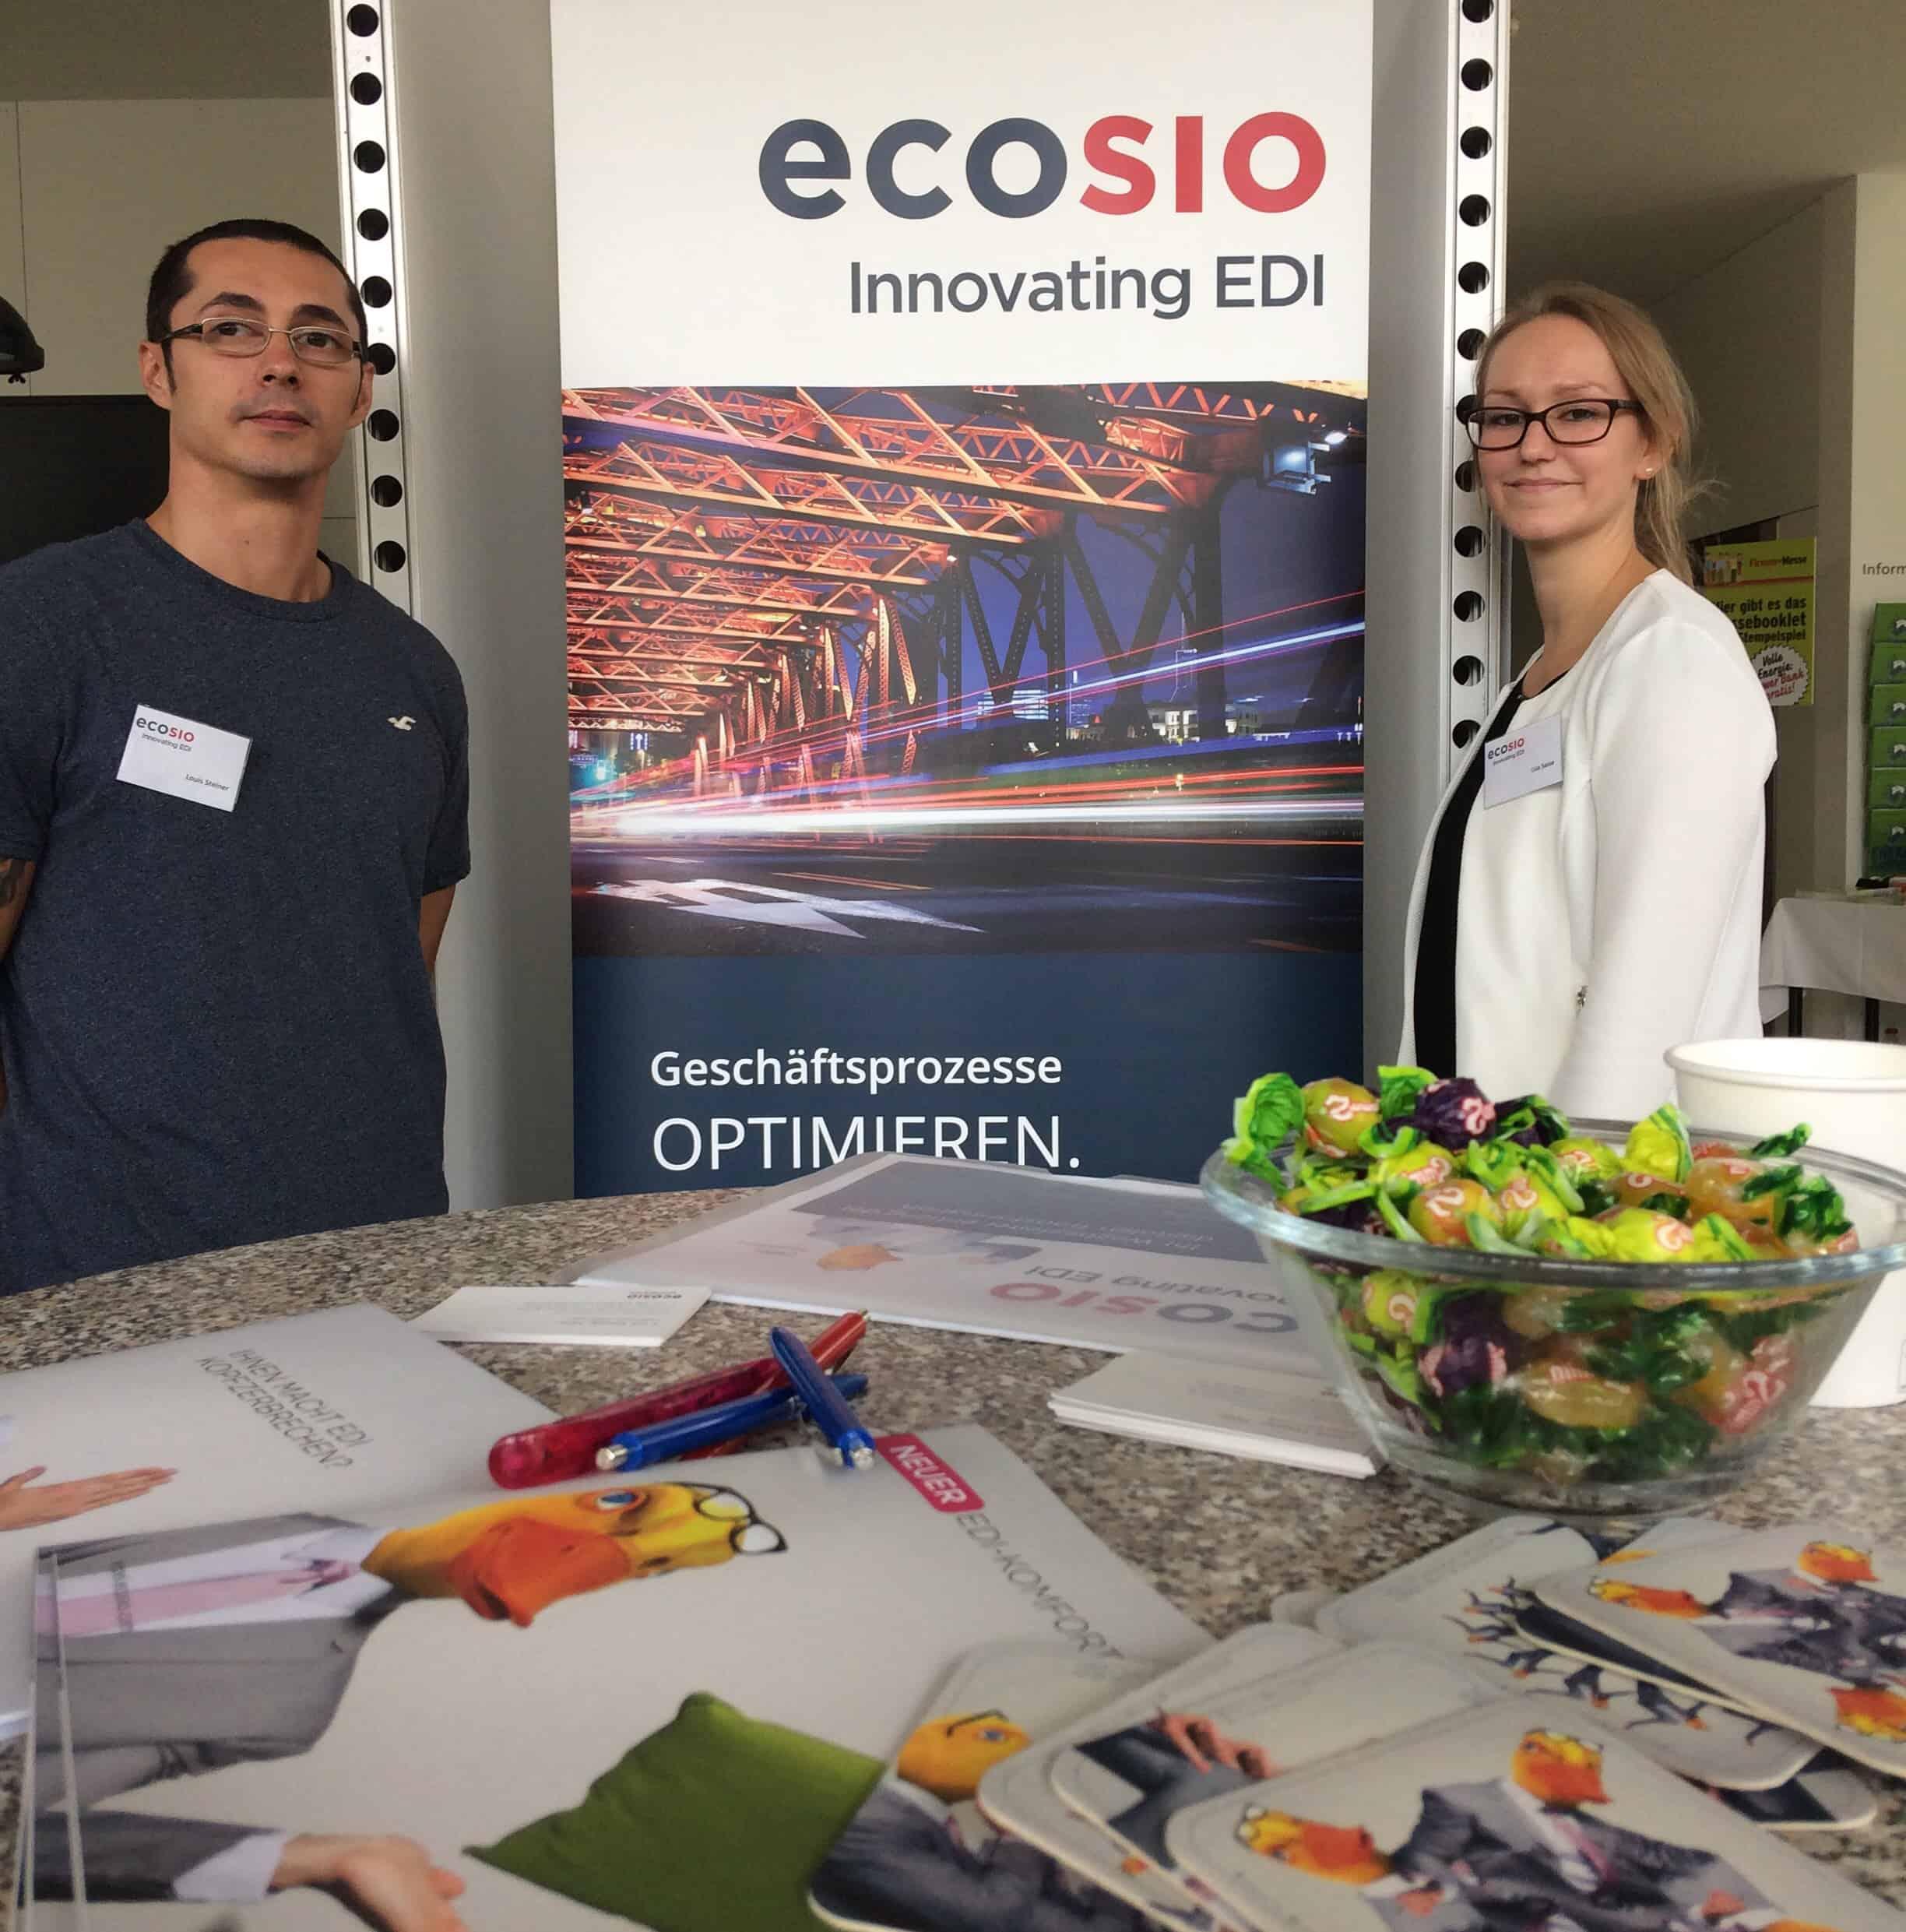 ecosio-Stand am FH Technikum Wien